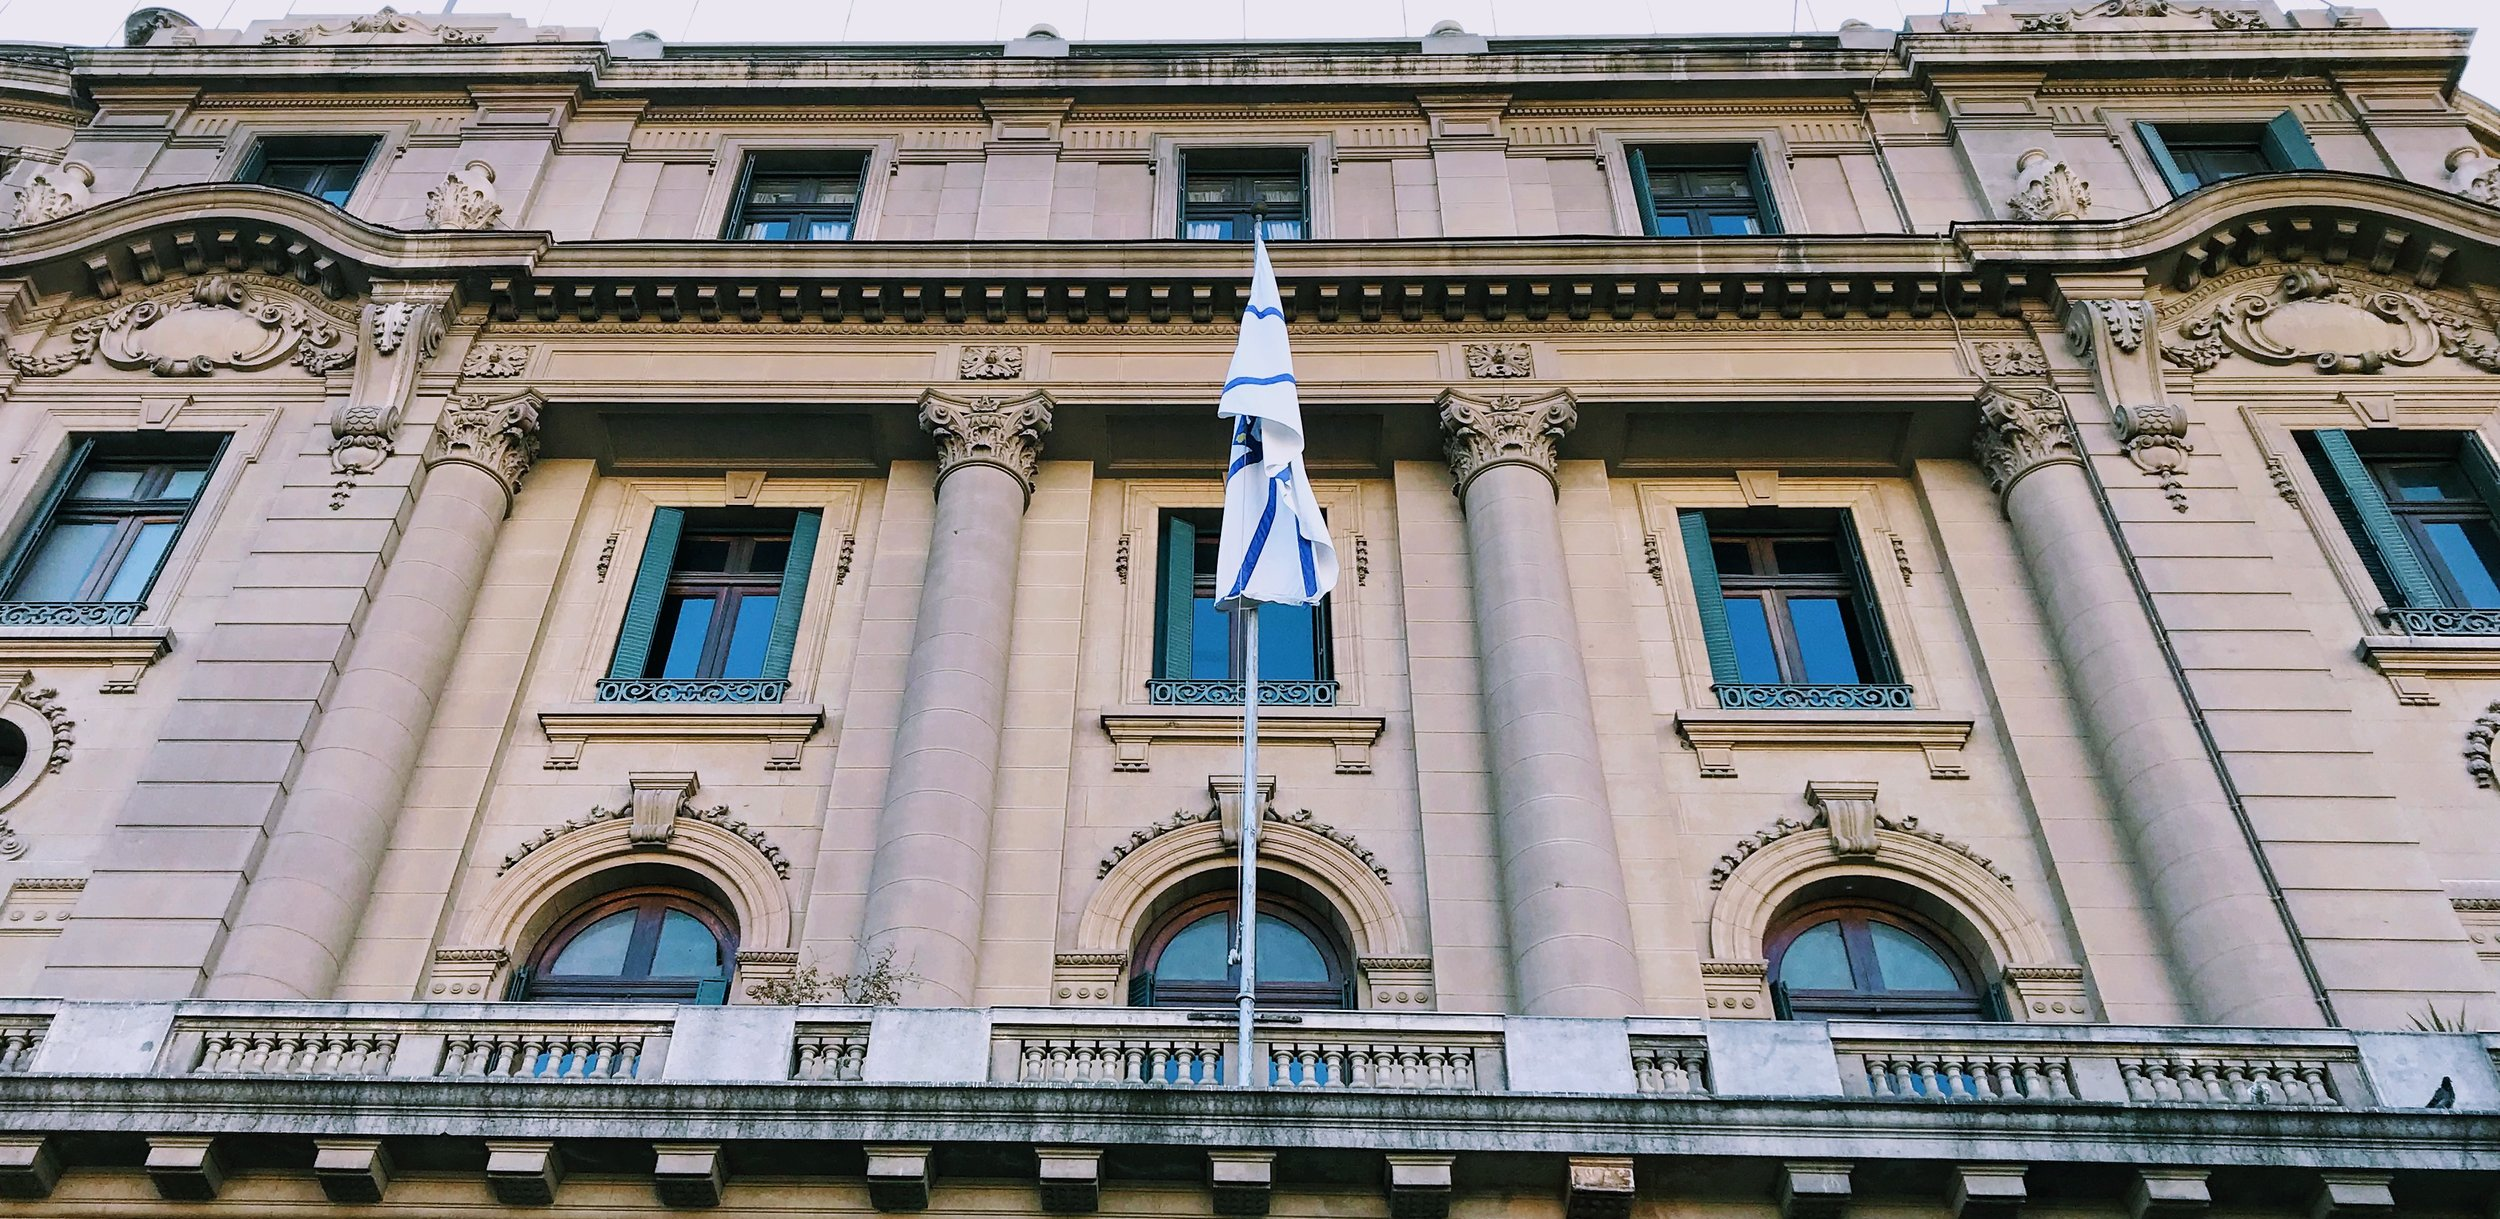 Historic building in Santiago, Chile